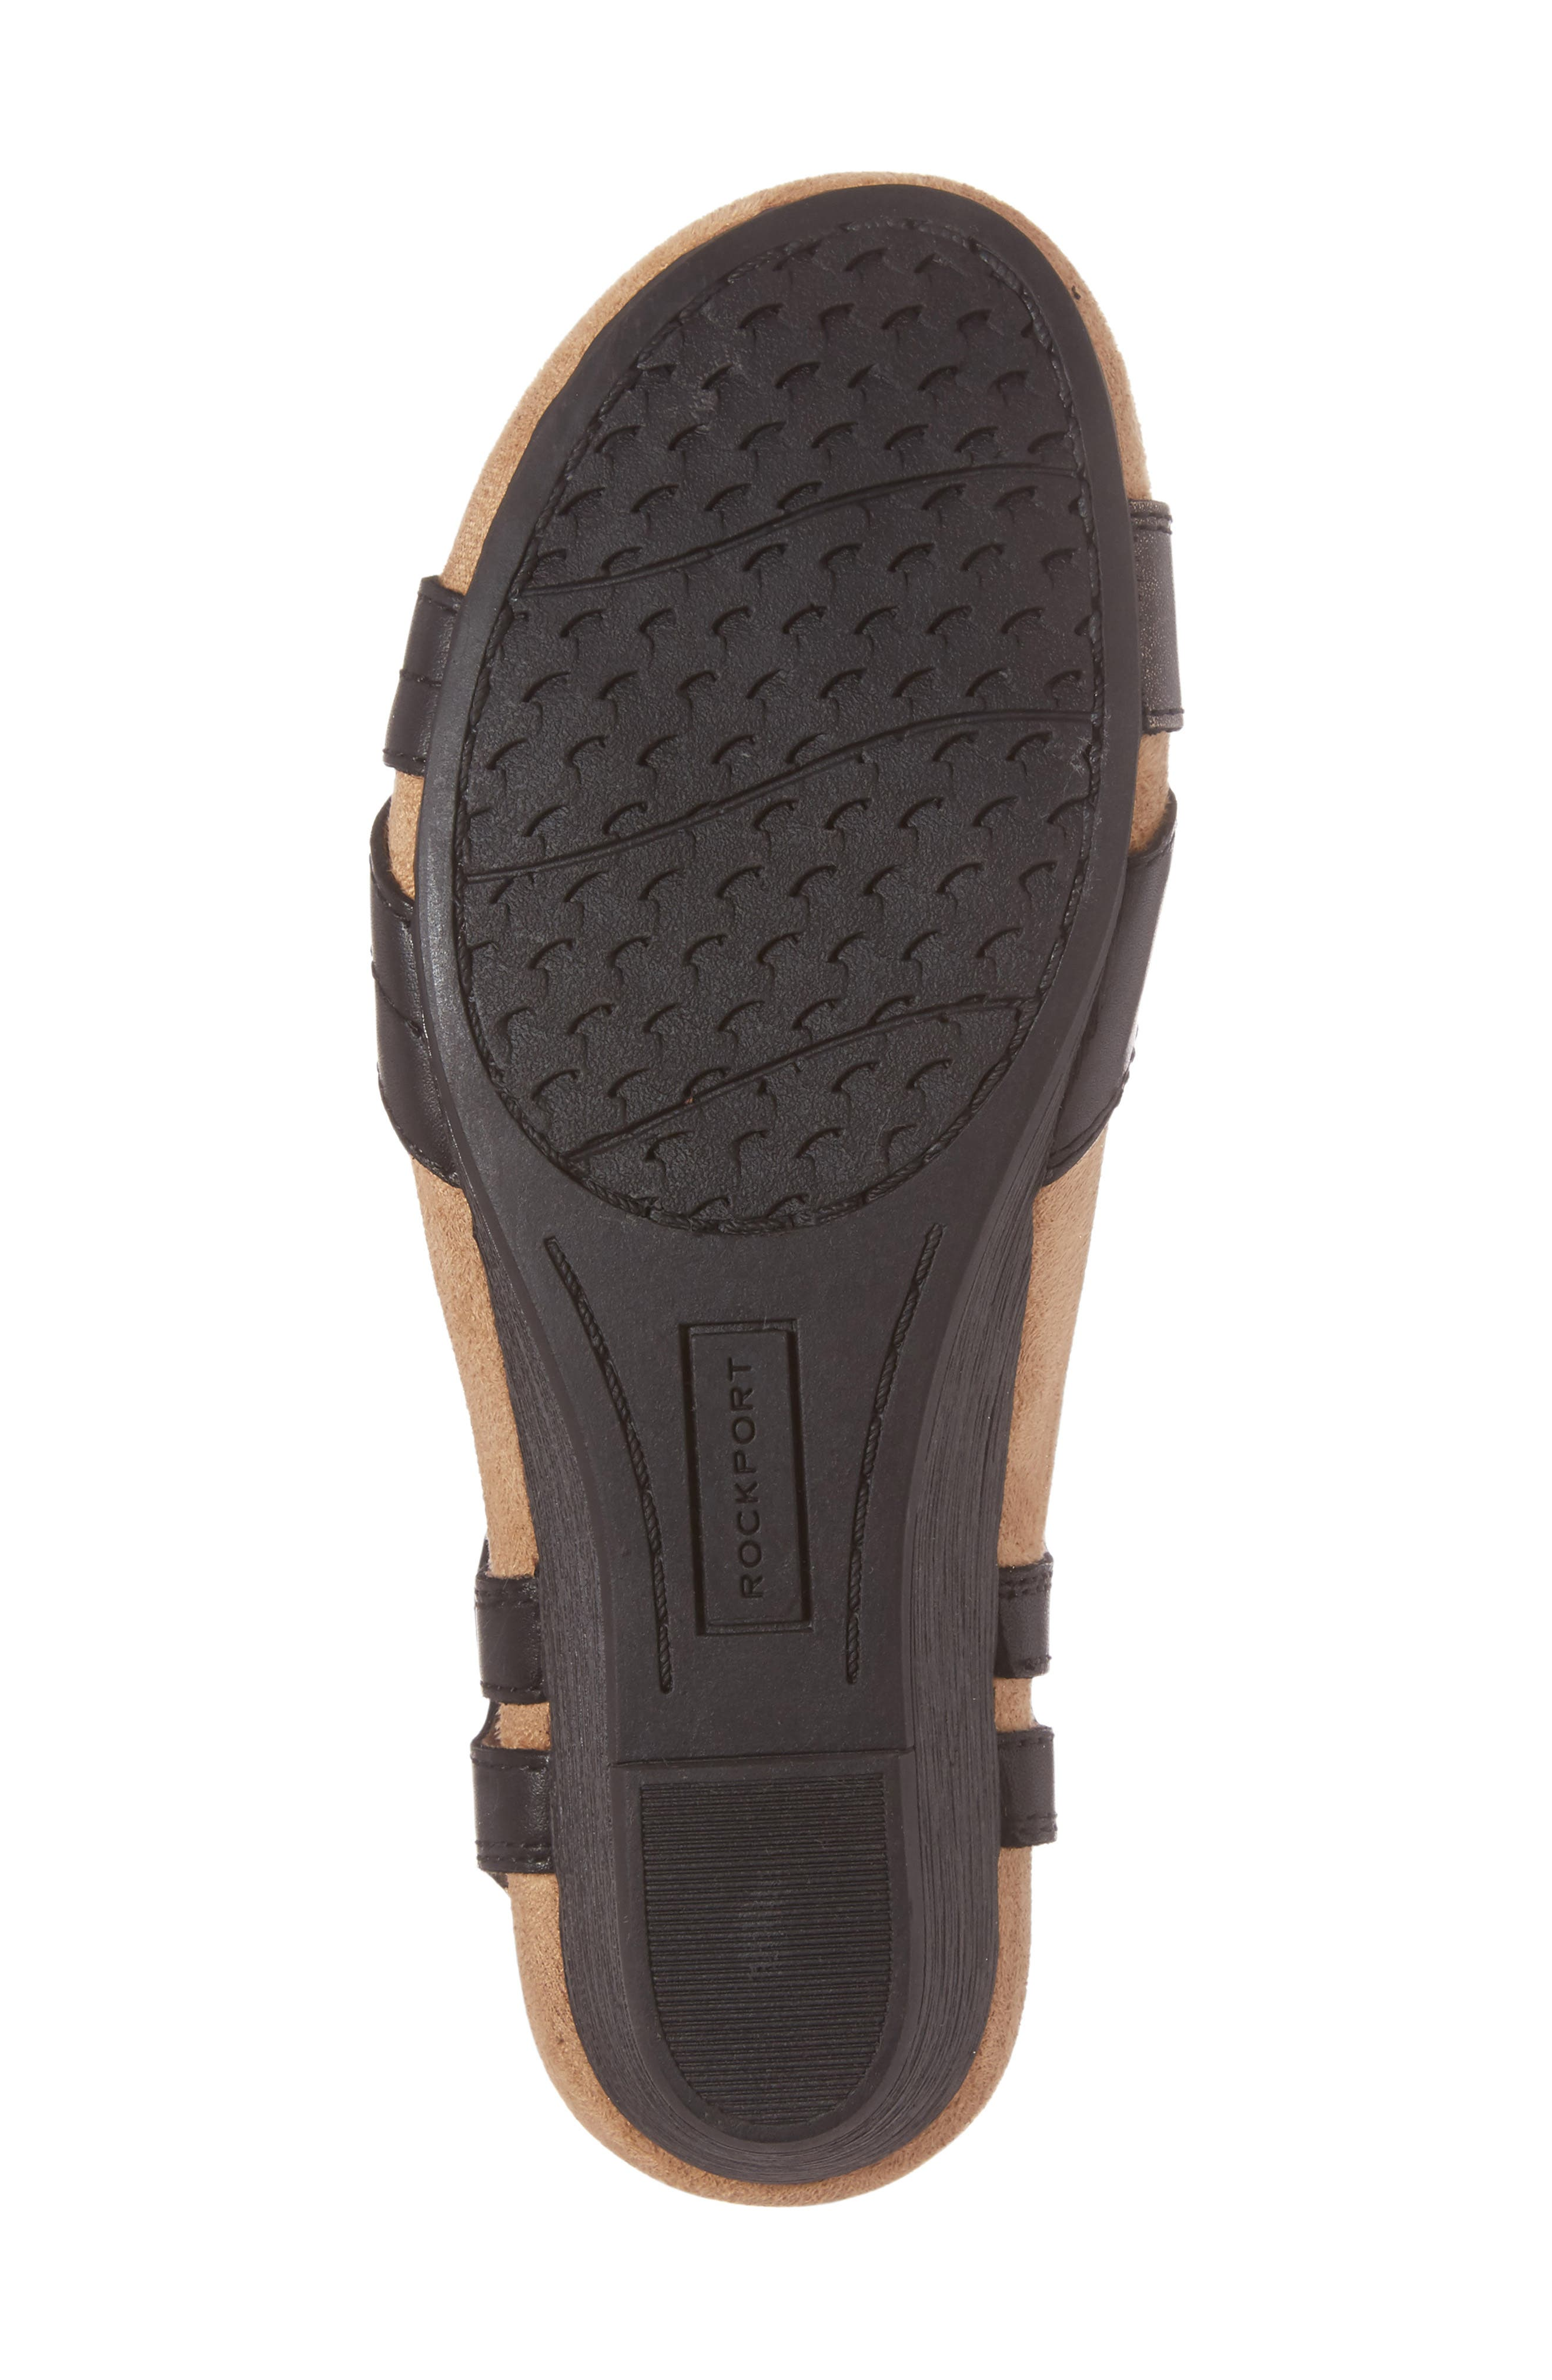 Hollywood Wedge Sandal,                             Alternate thumbnail 6, color,                             BLACK LEATHER